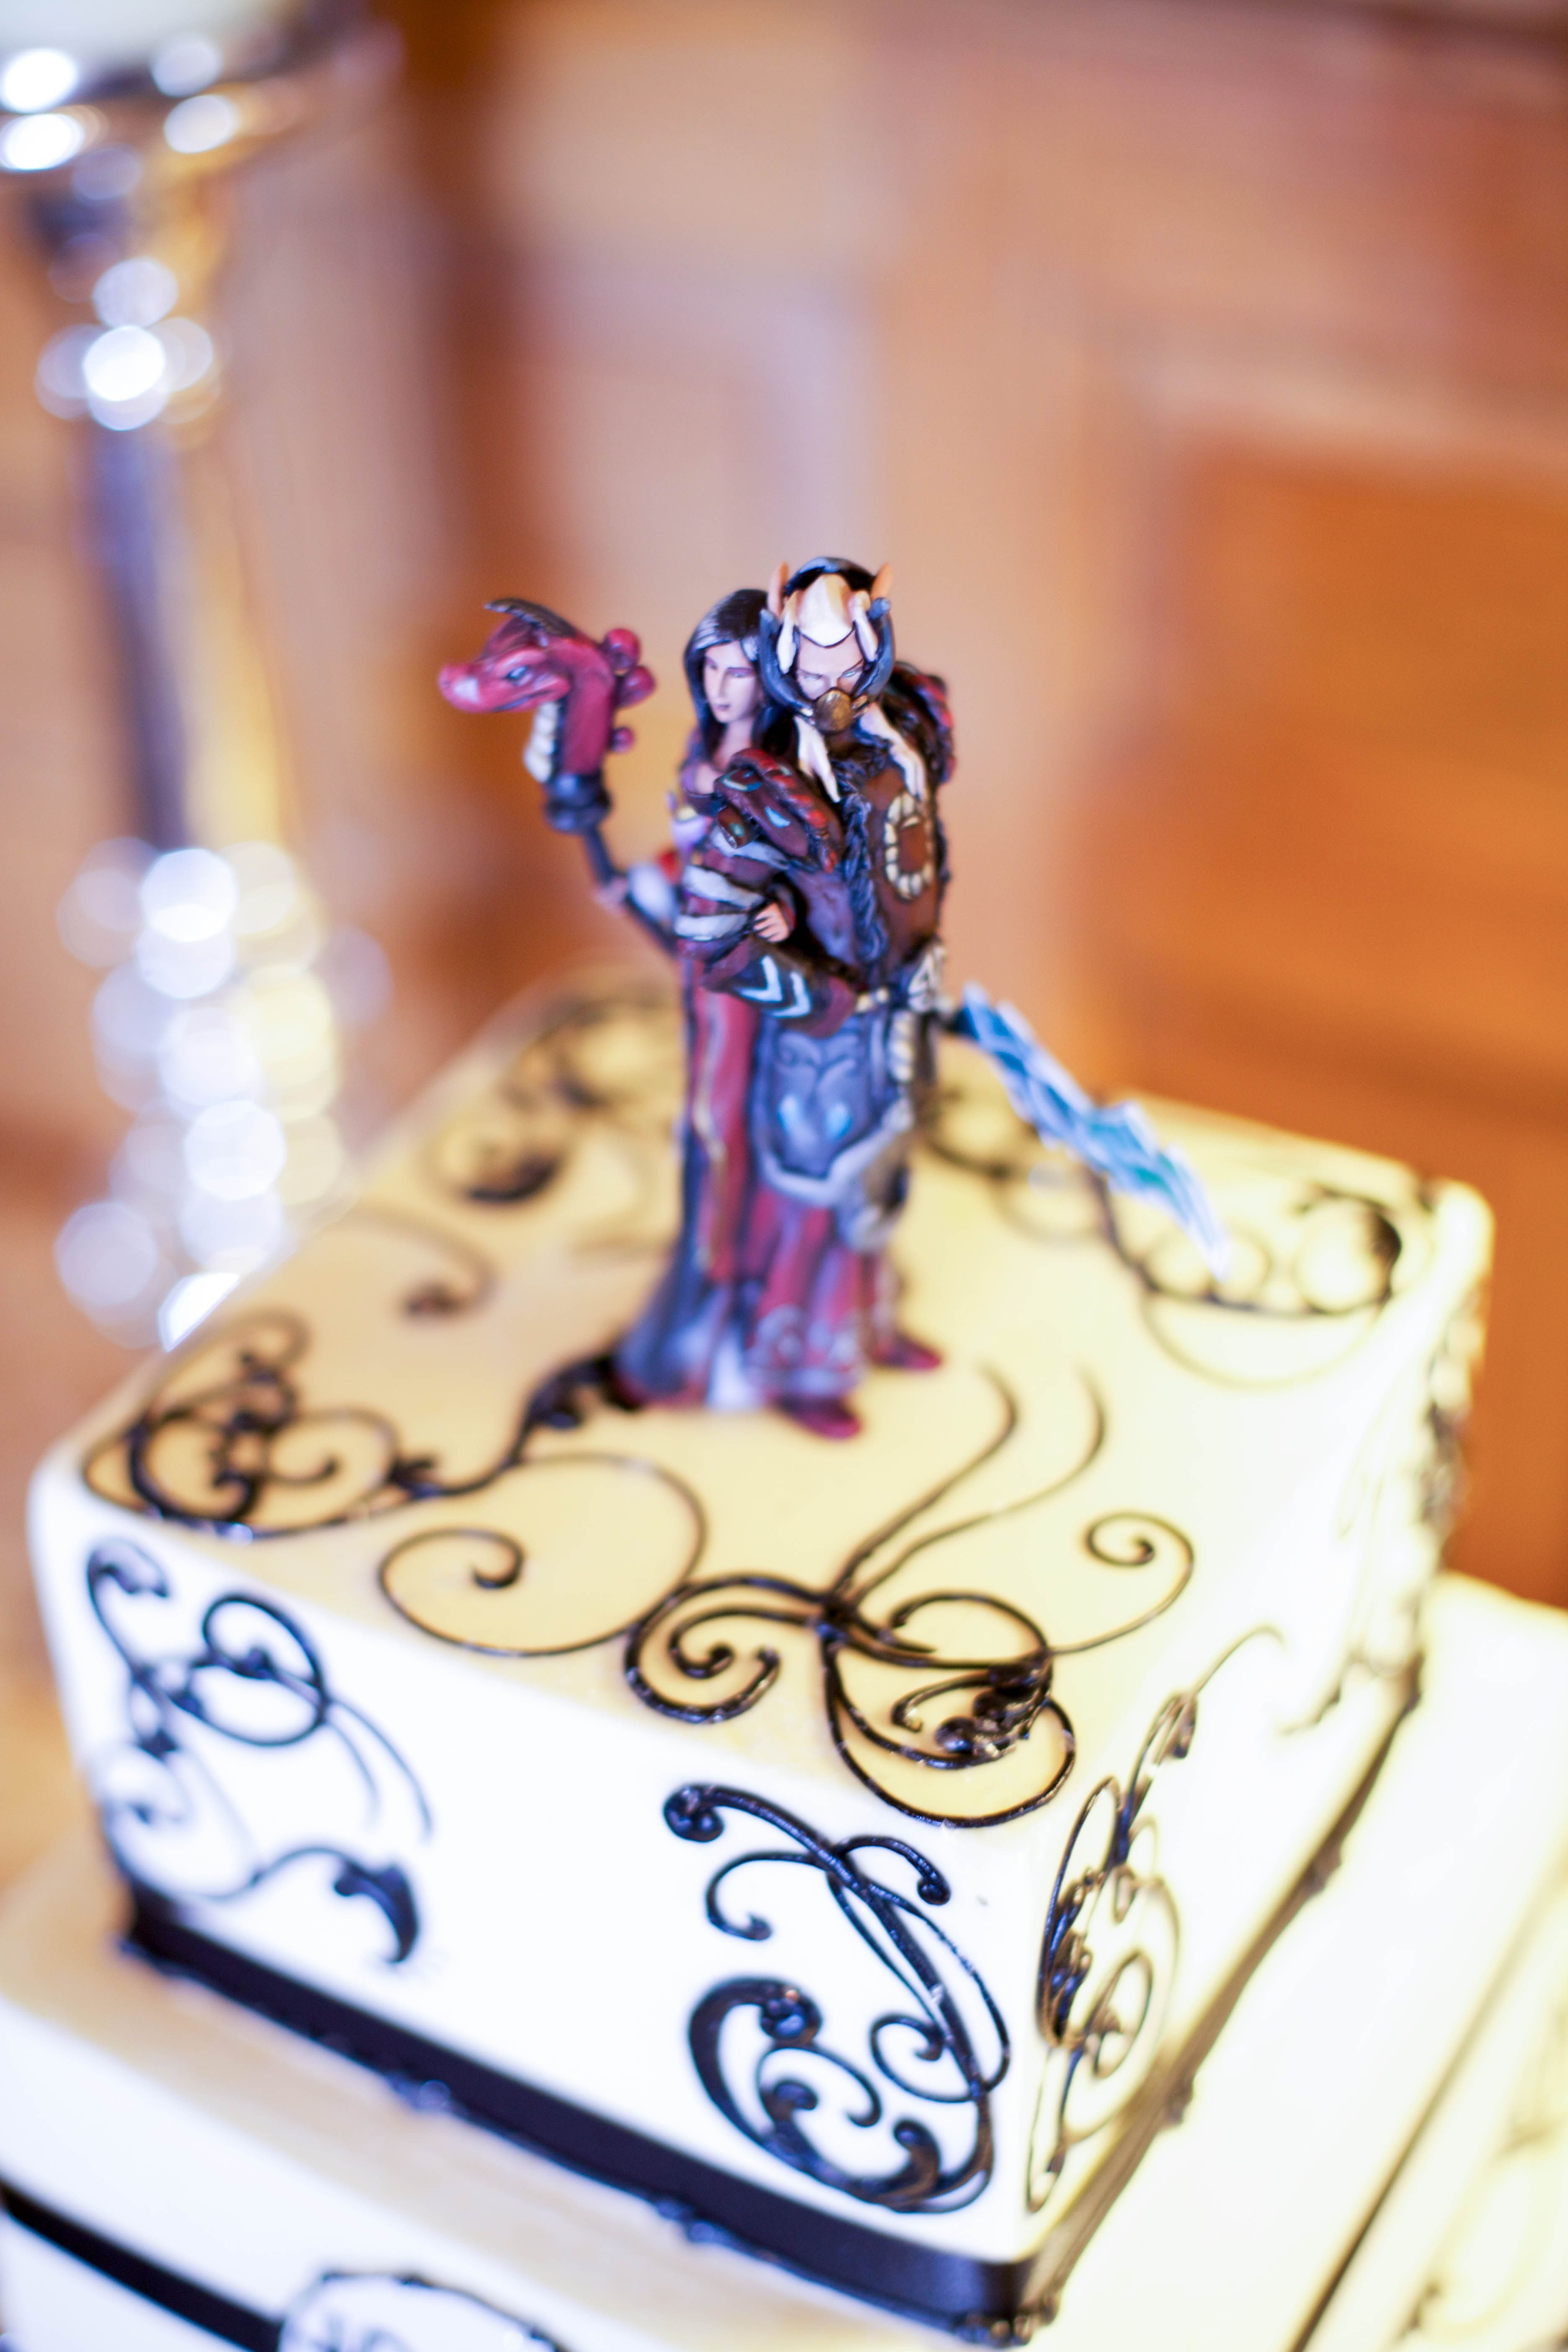 World Of Warcraft Wedding Cake Toppers Nerd Wedding Video Game Wedding Wedding Cake Toppers